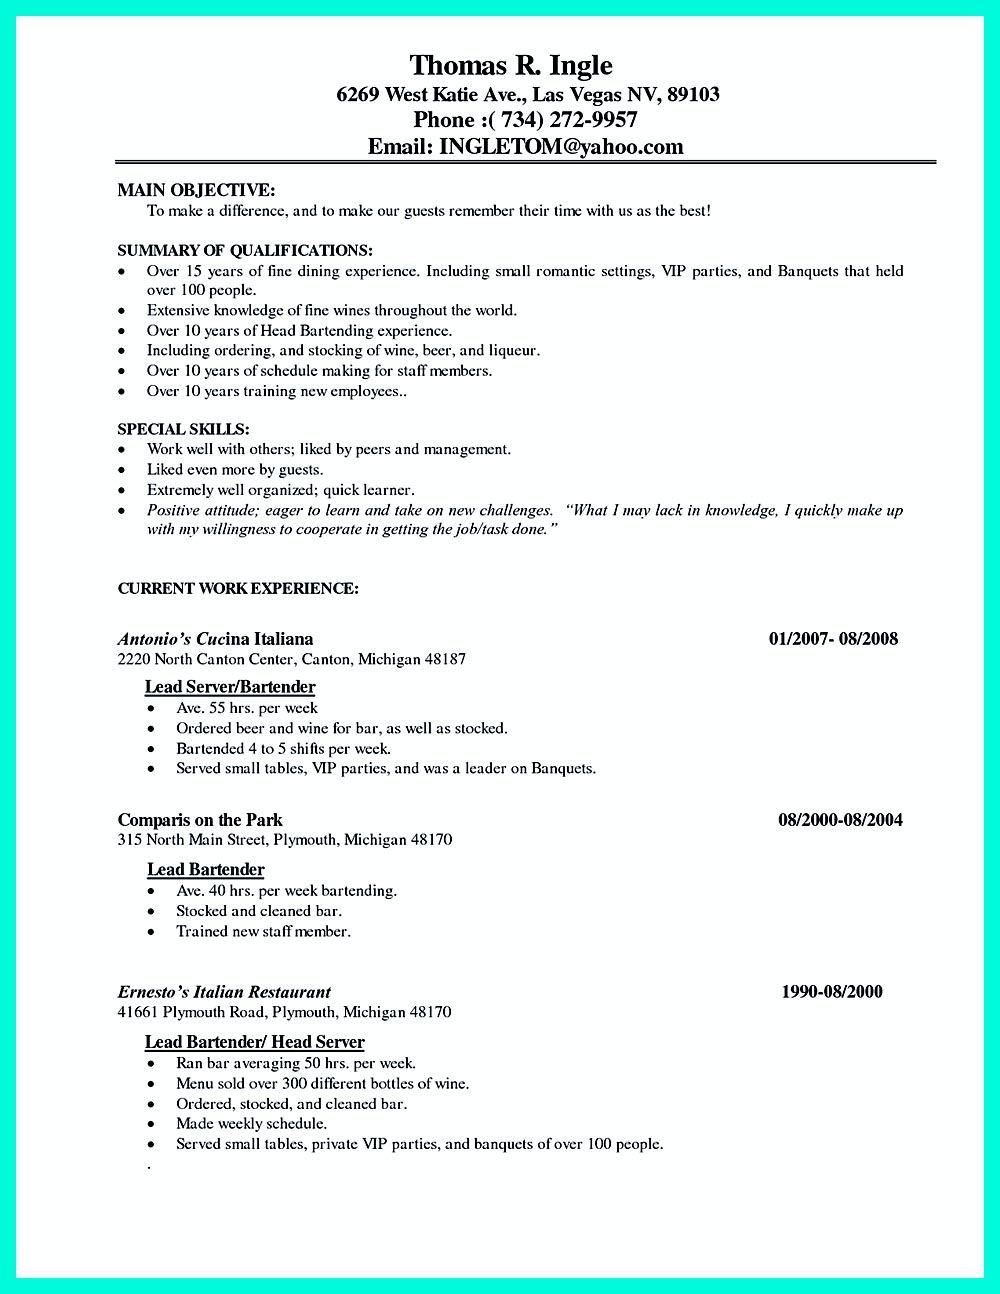 Restaurant Cafe Job Description